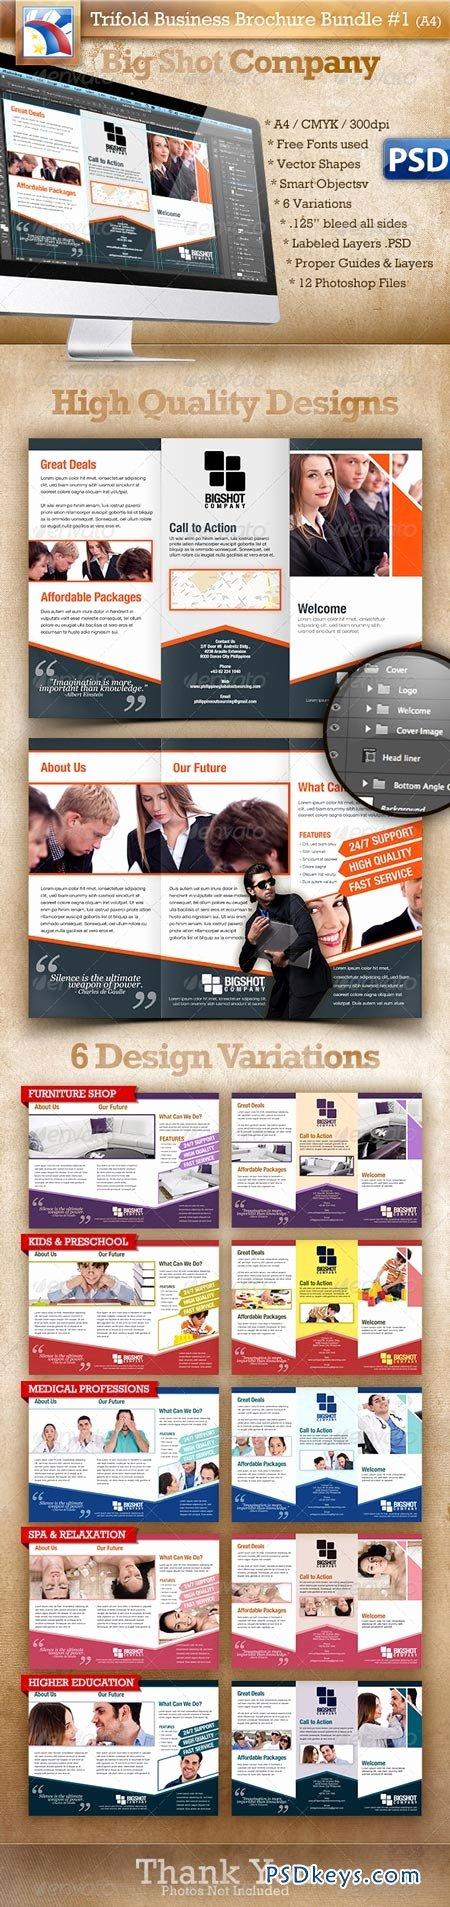 Trifold Brochure Template Photoshop Fresh A4 Trifold Brochure Template Psd 6 Variations 1 Free Download Shop Vector Stock